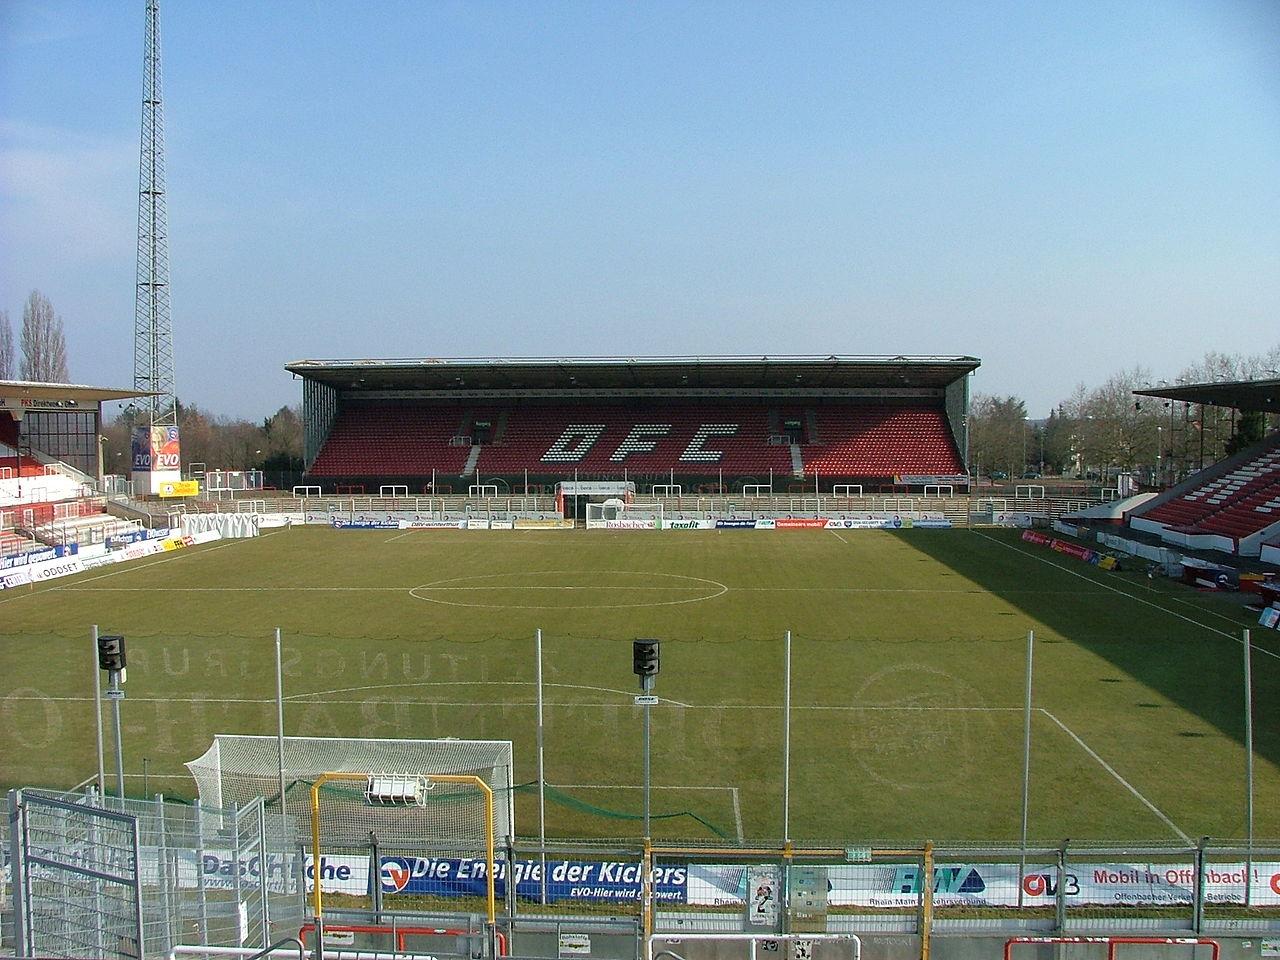 1280px-Diba_stadion_offenbach_04.JPG